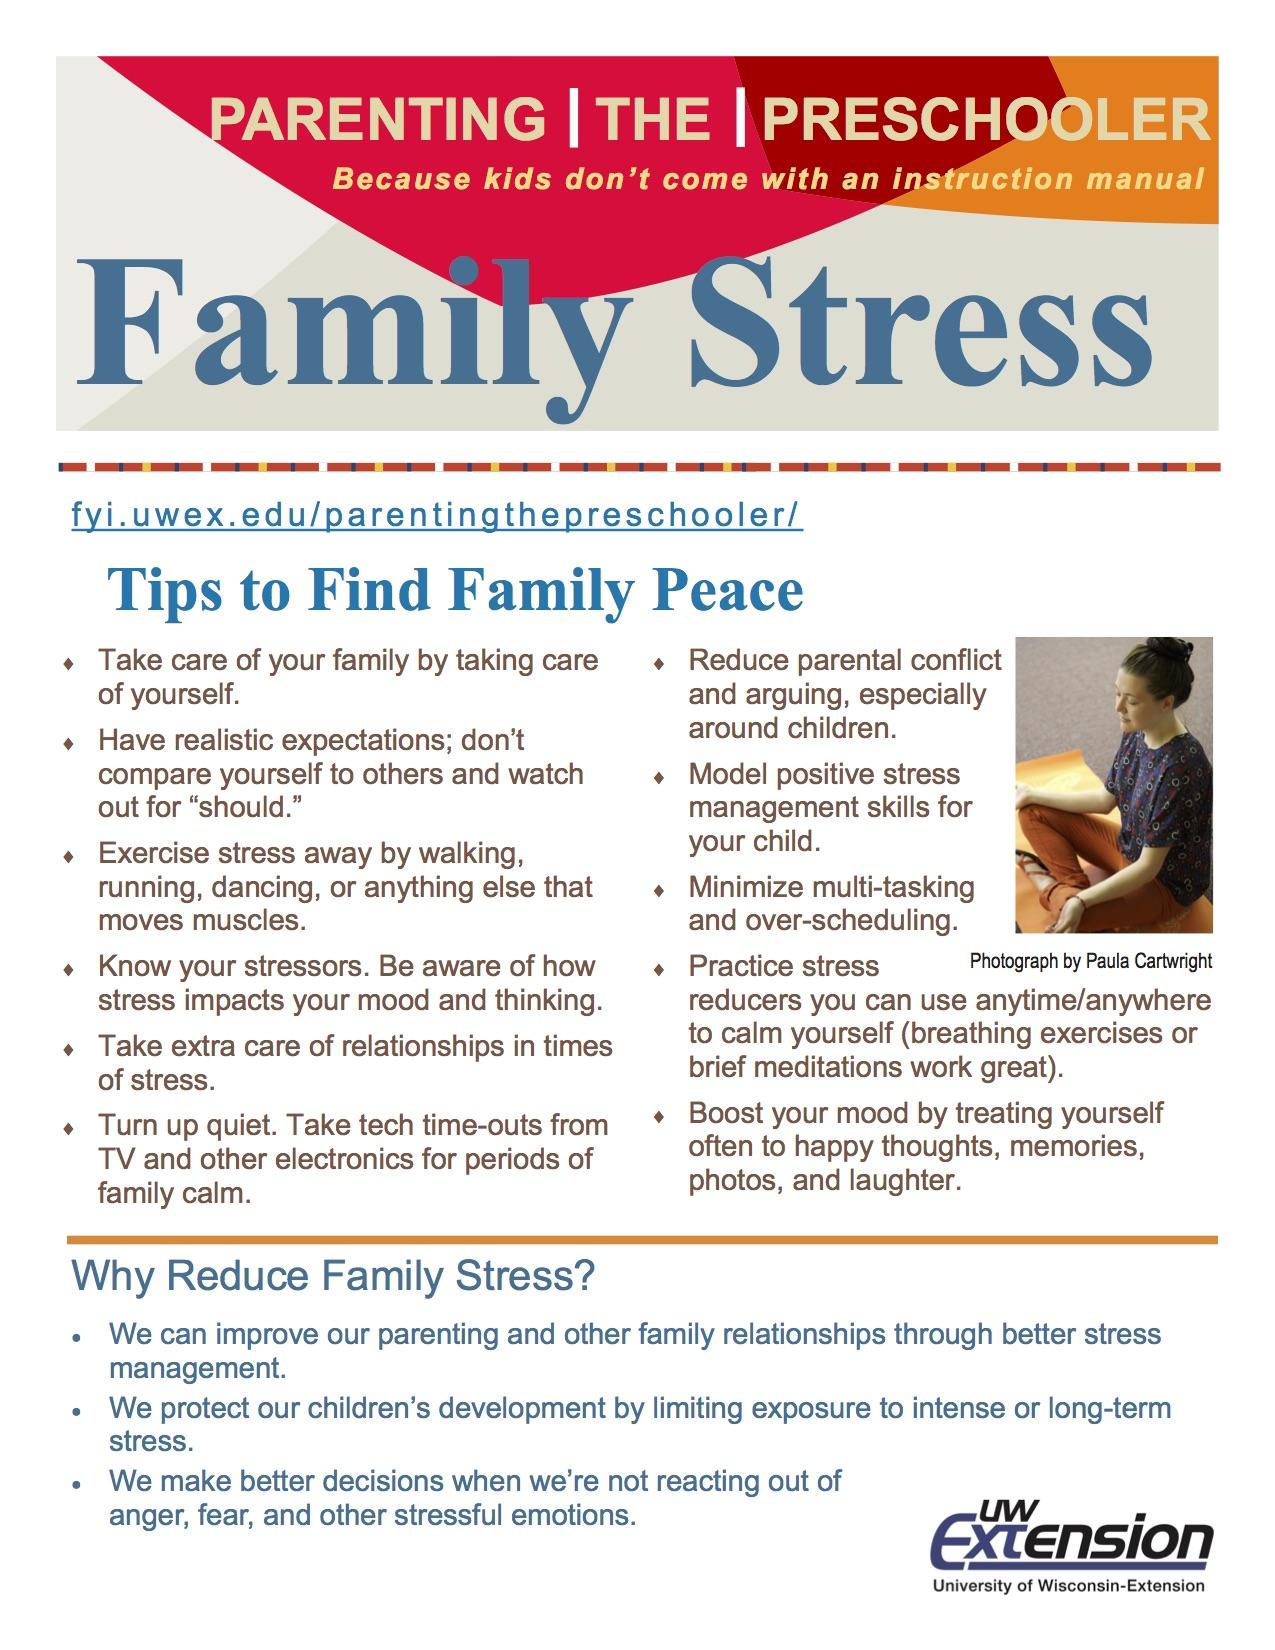 PtP-Family-Stress